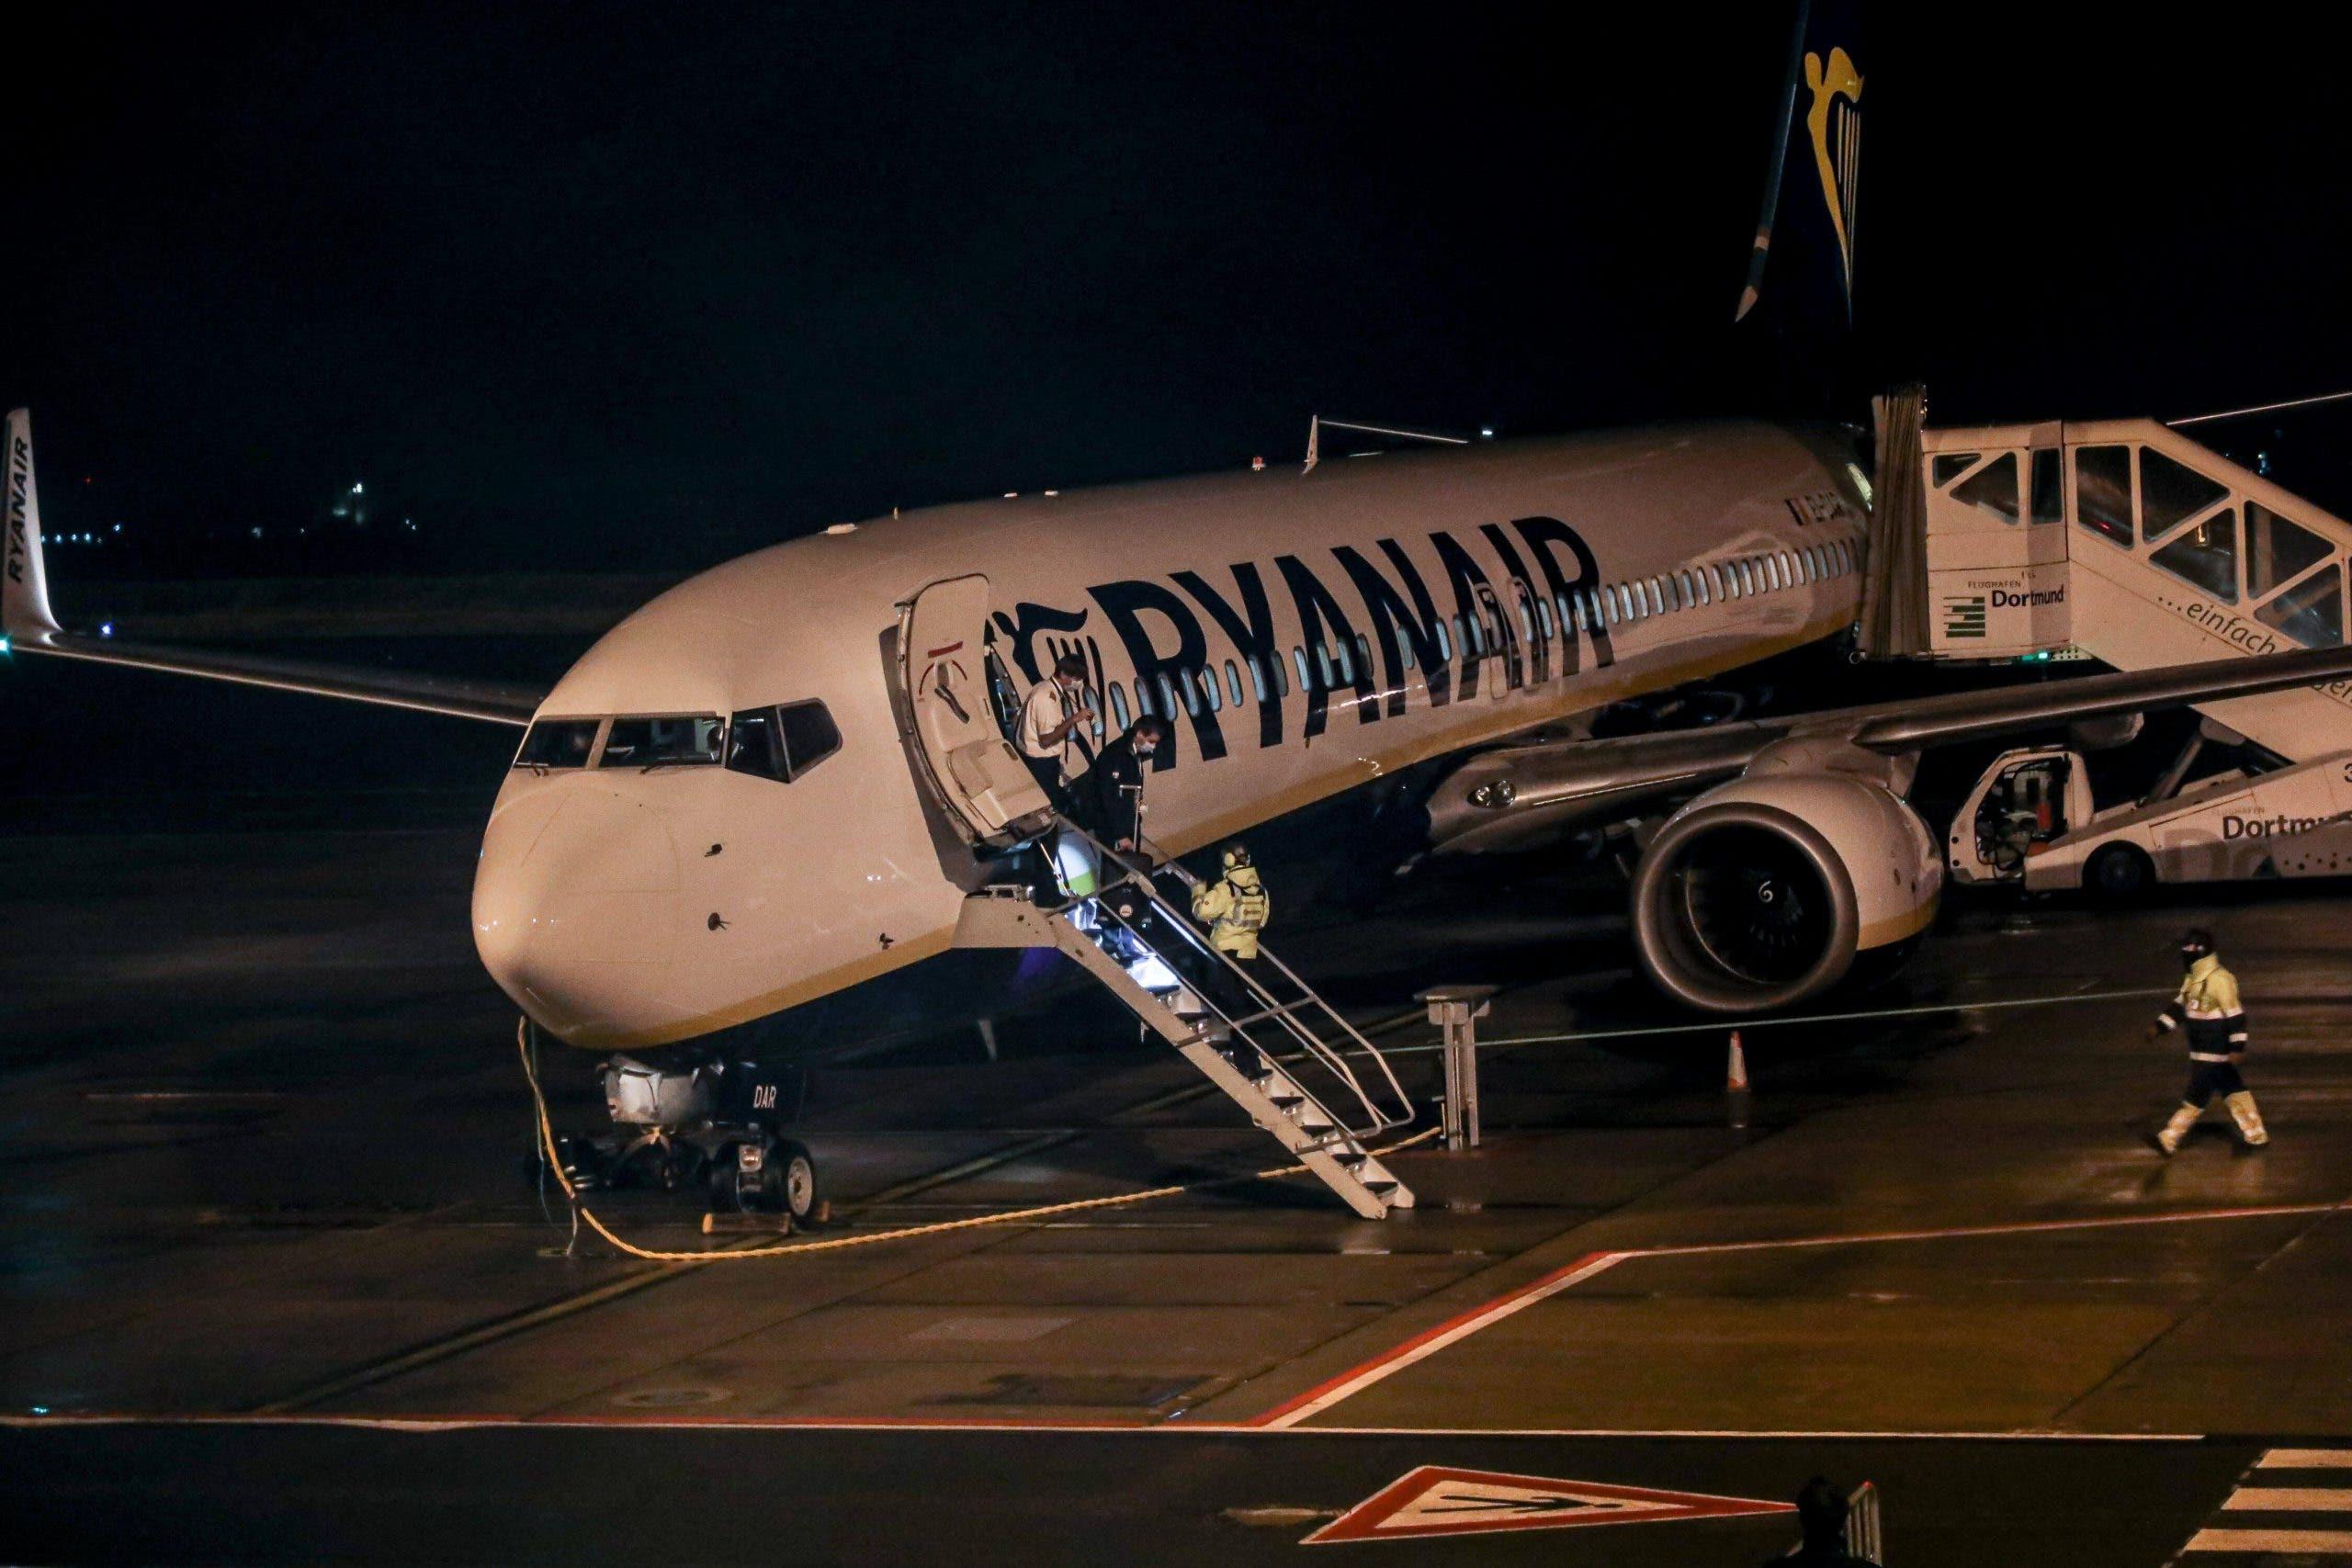 A Ryanair plane after landing